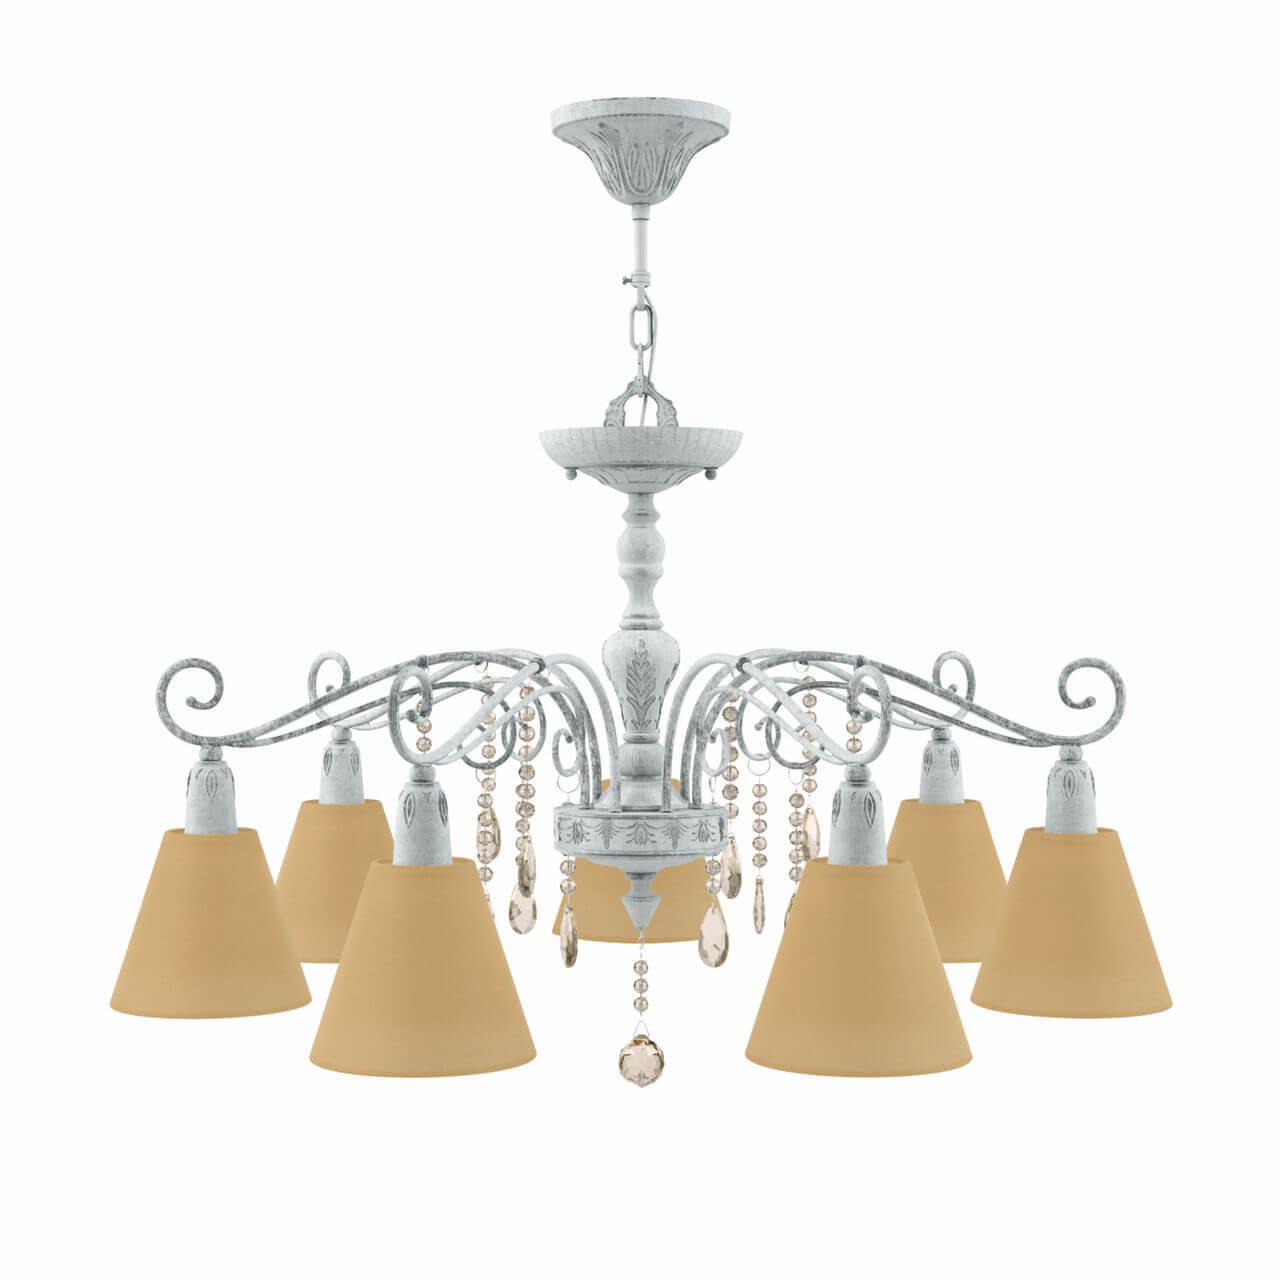 цена на Люстра Lamp4you E4-07-G-LMP-O-23-CRL-E4-07-CH-DN Provence